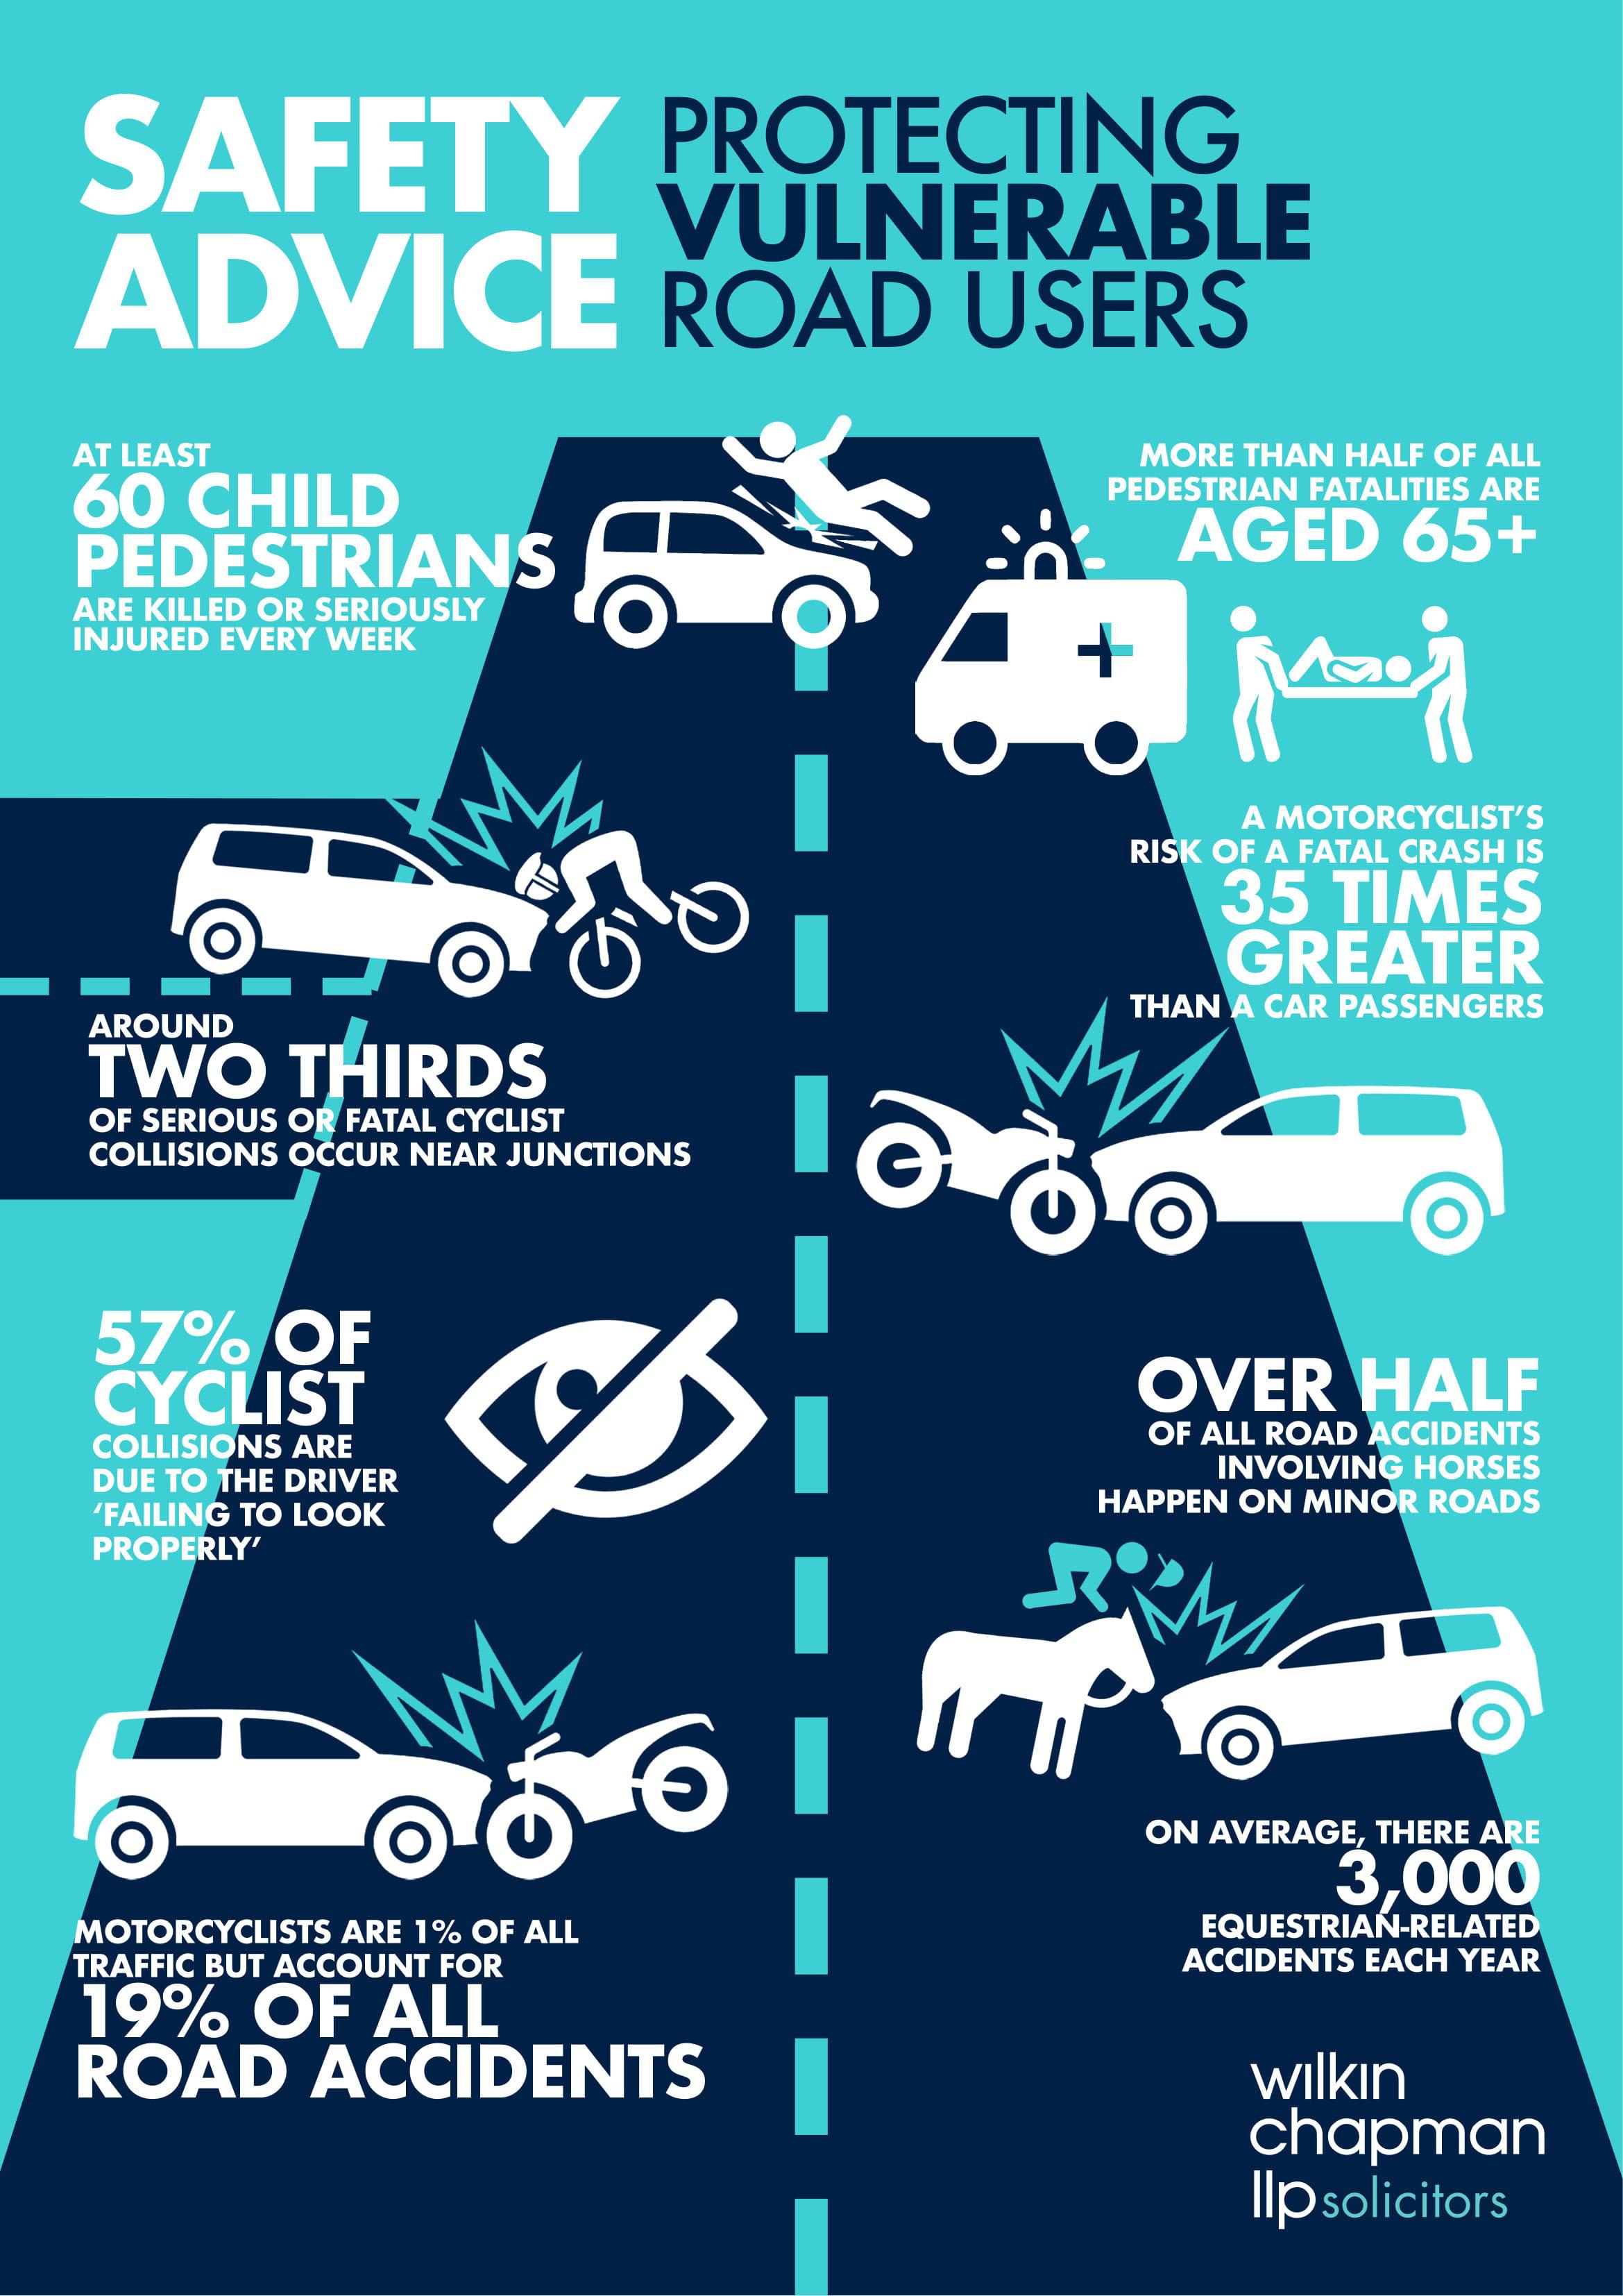 WC_SafetyAdvice_A3poster_infographic-1.jpg#asset:4507